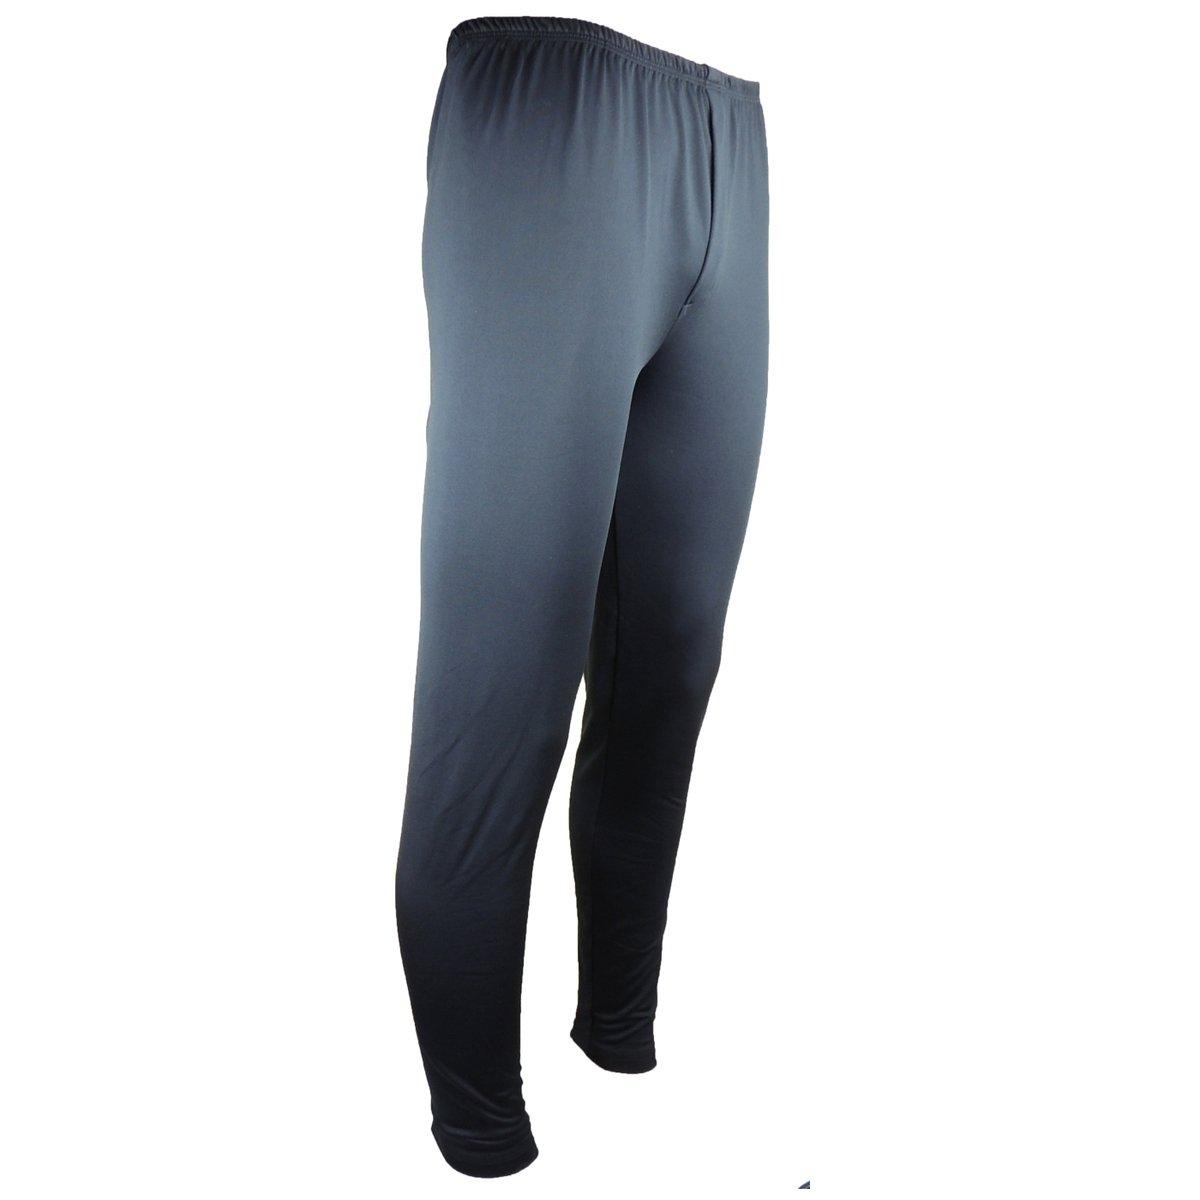 Calça Térmica Segunda Pele Thermo Premium Masculina - Preto - Compre ... 40e4ae3db0049